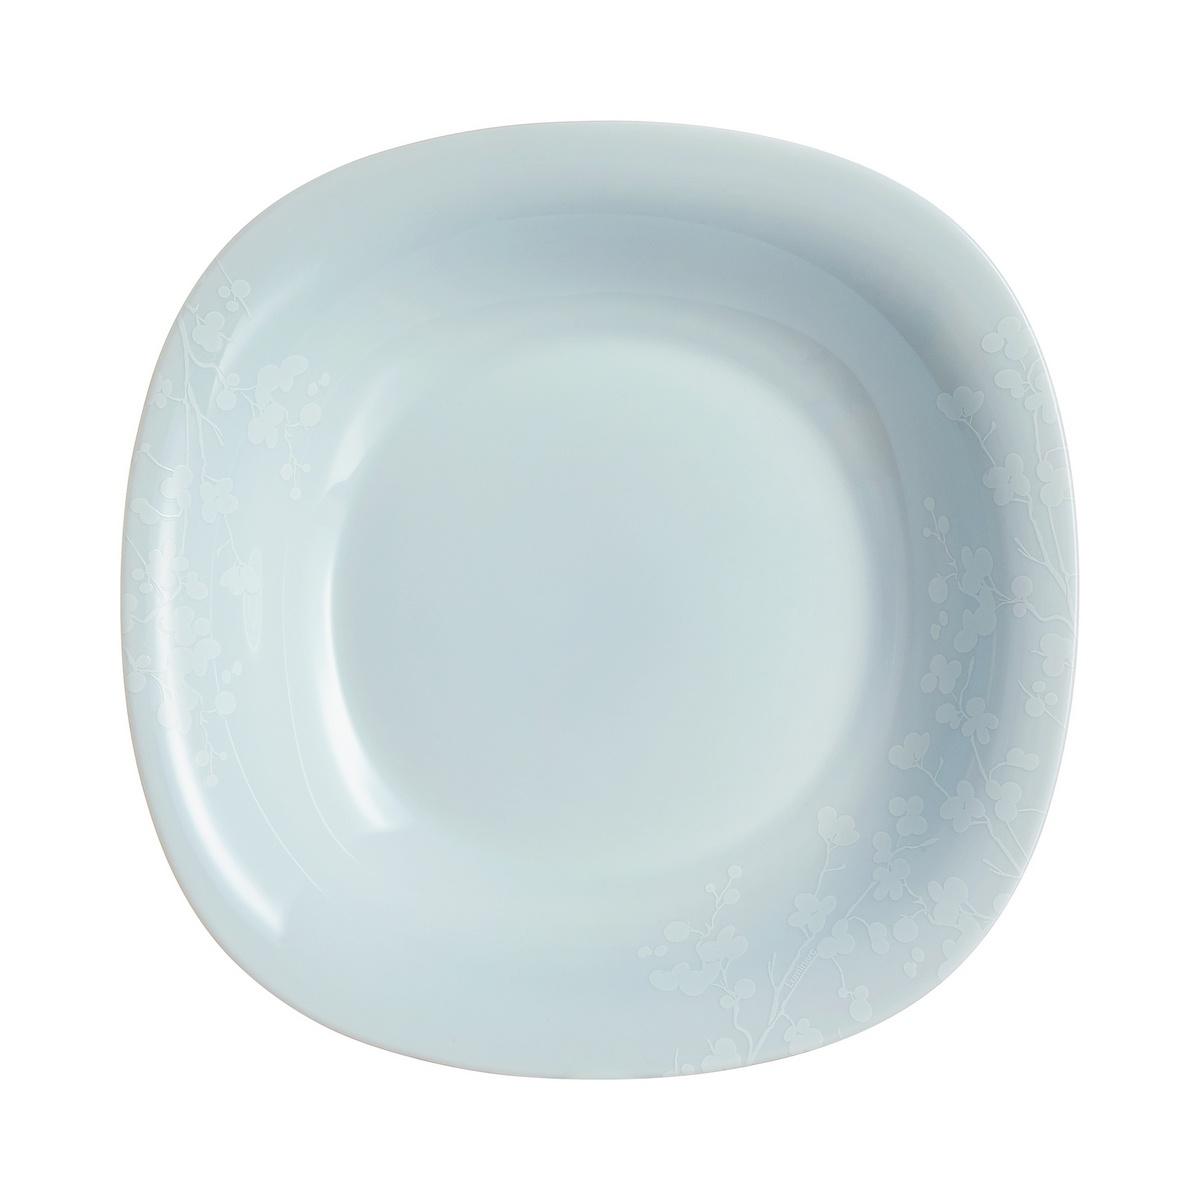 Luminarc Sada hlubokých talířů Ombrelle 21 cm, 6 ks, šedá